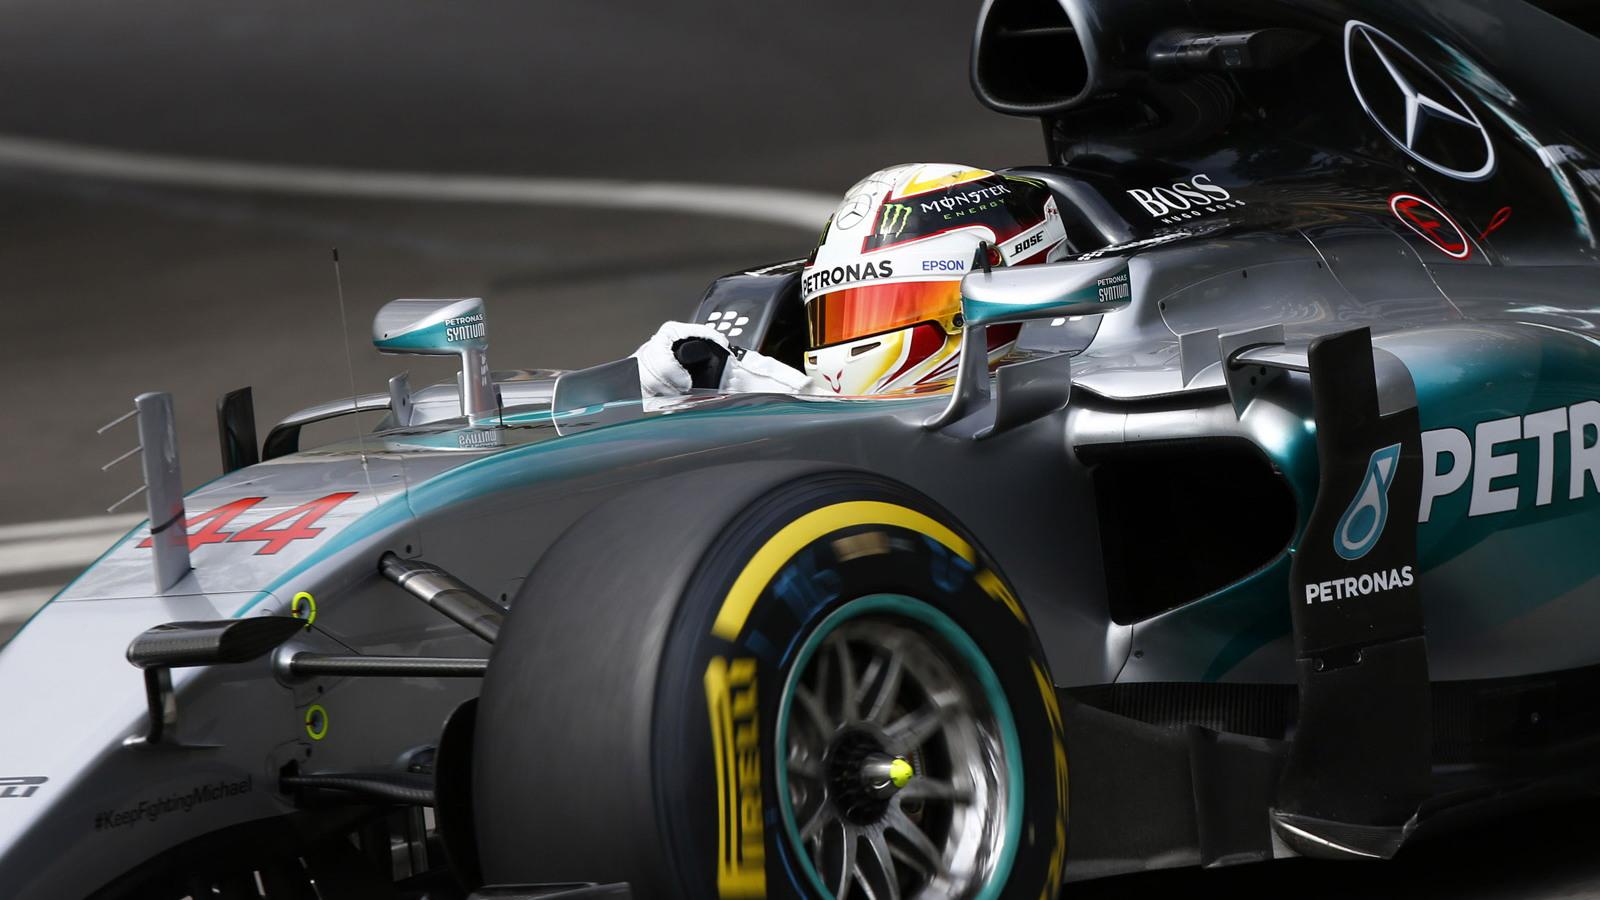 Mercedes AMG's Lewis Hamilton at the 2015 Formula One Monaco Grand Prix Pole